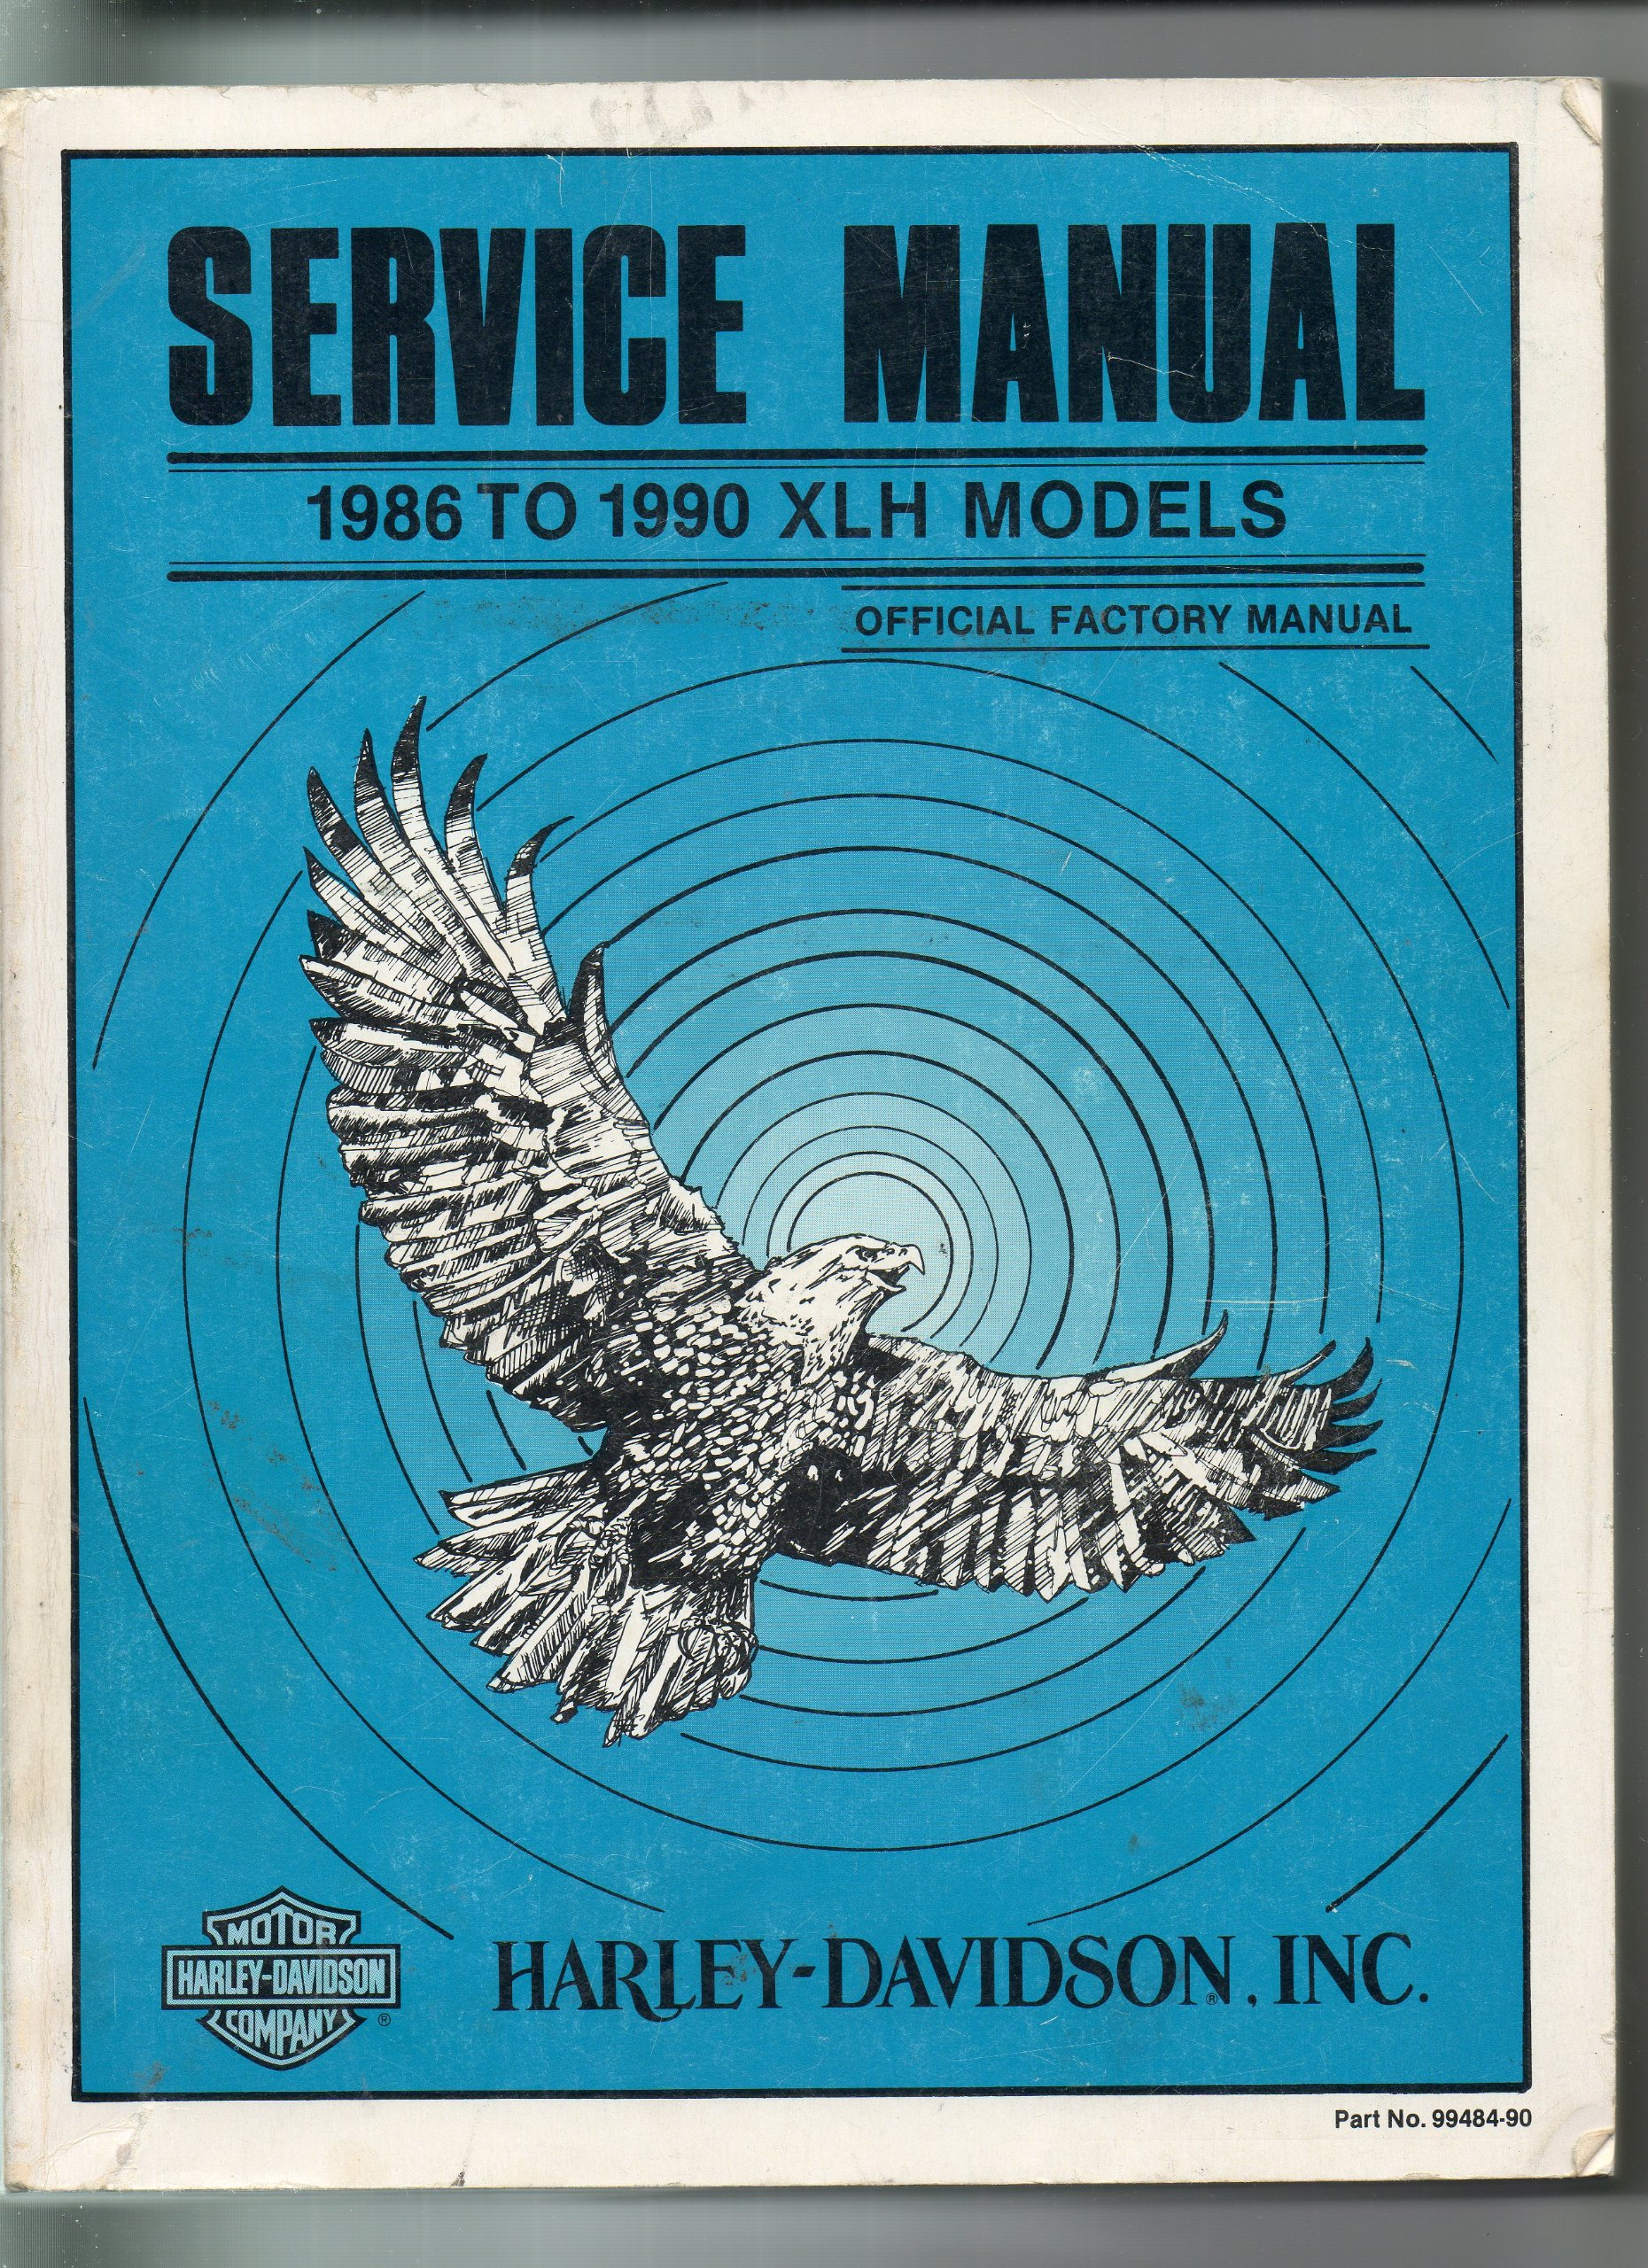 harley davidson service manual 1986 to 1990 xlh models harley rh amazon com 1990 harley davidson sportster service manual 2000 Sportster